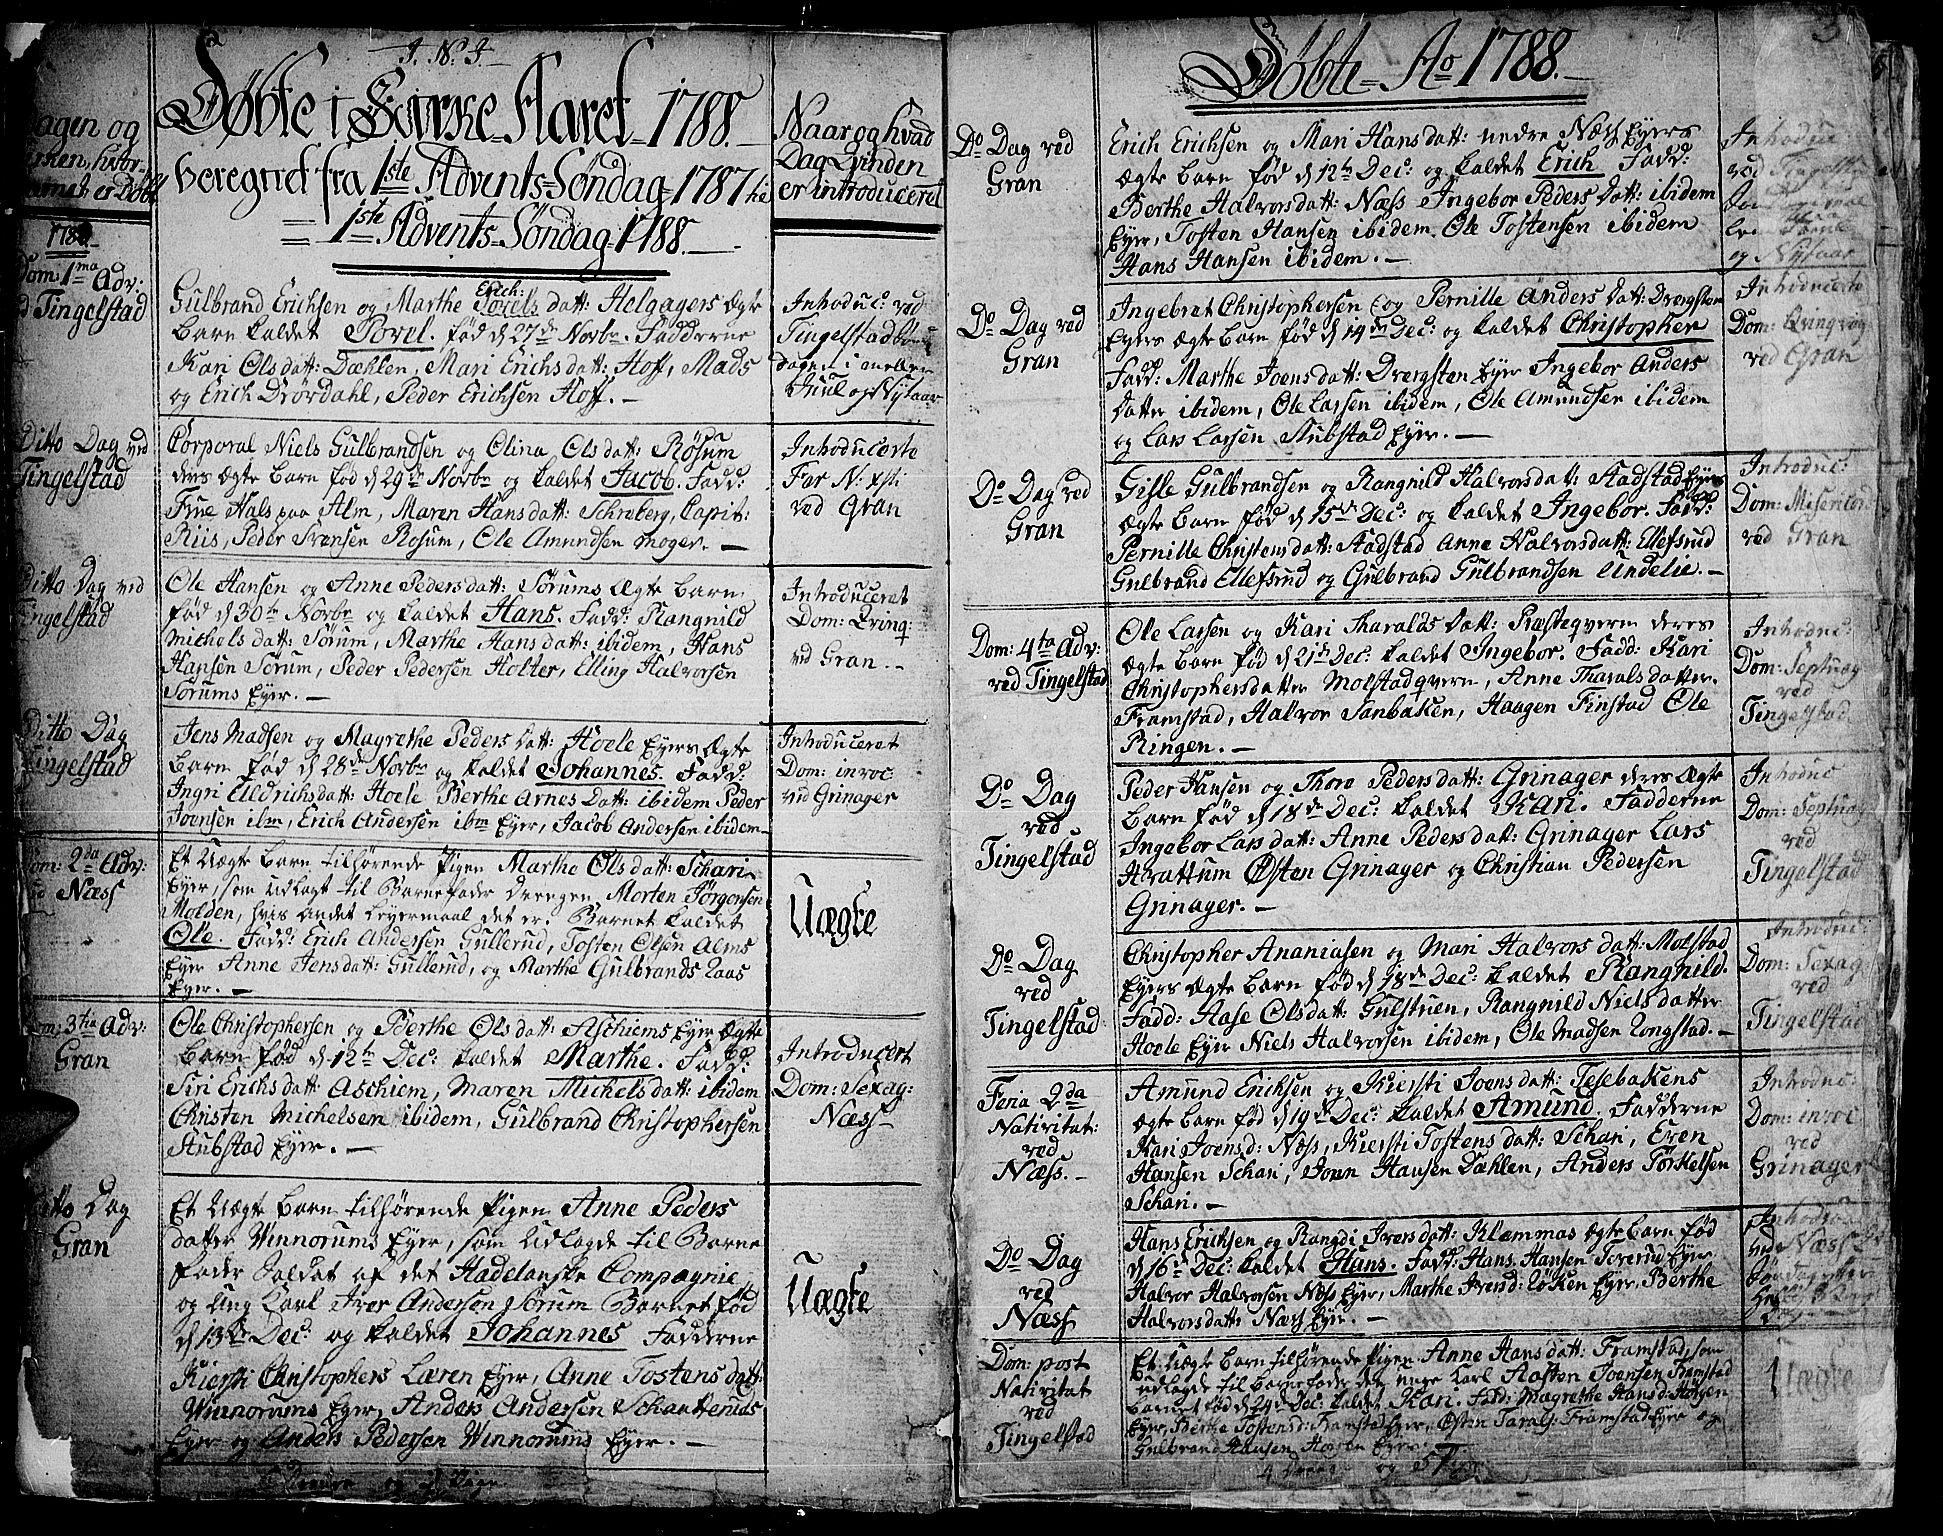 SAH, Gran prestekontor, Ministerialbok nr. 6, 1787-1824, s. 2-3